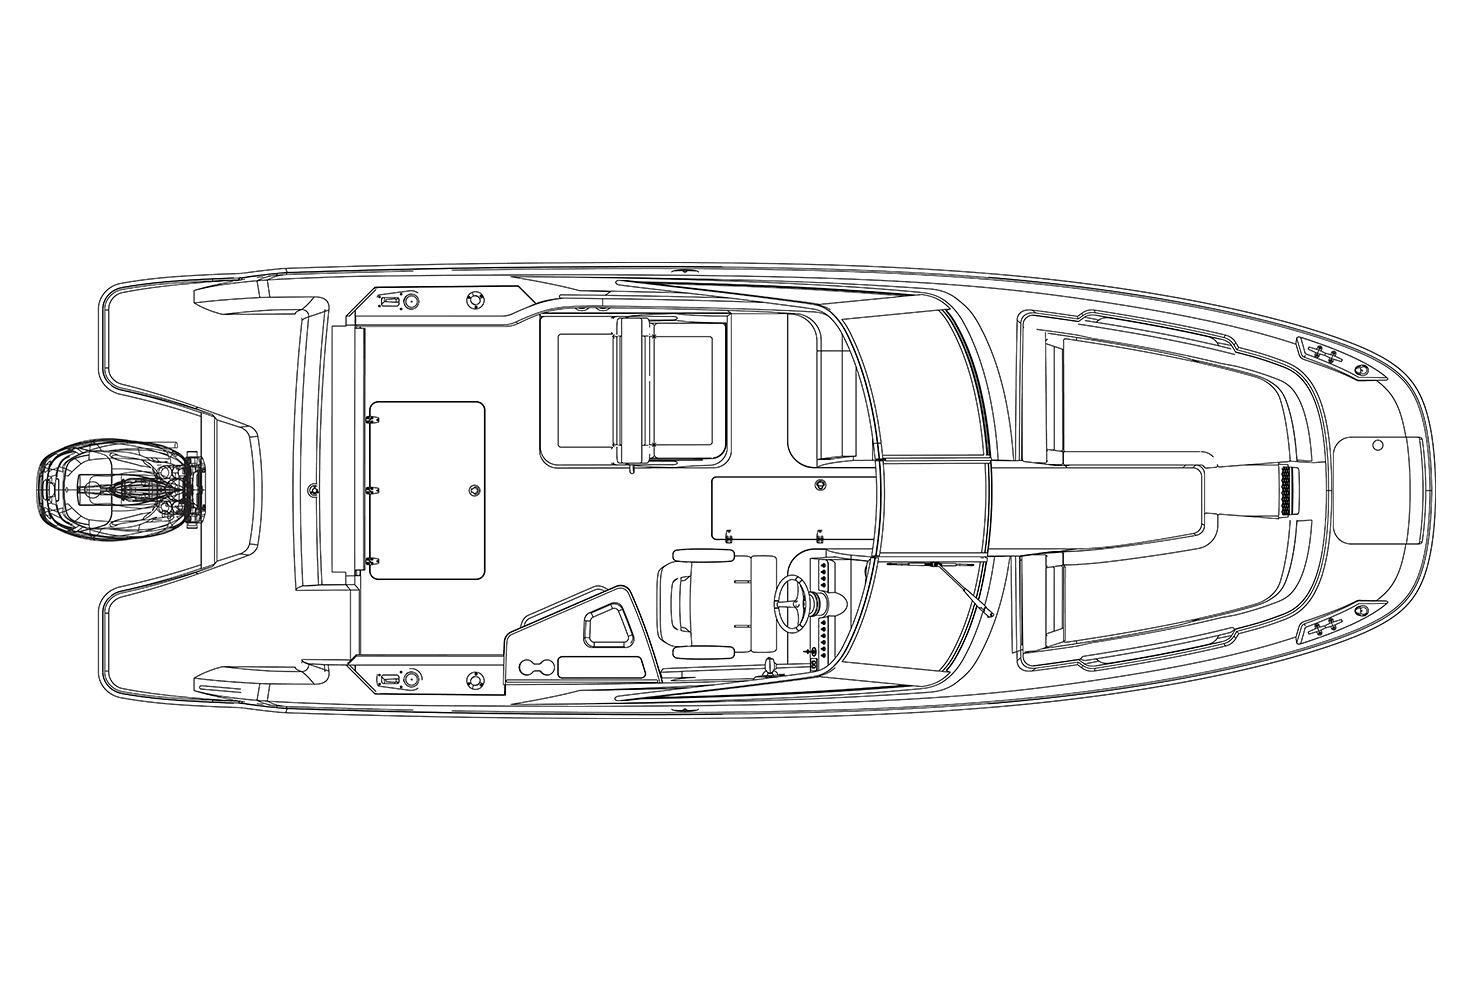 Boston Whaler230 Vantage